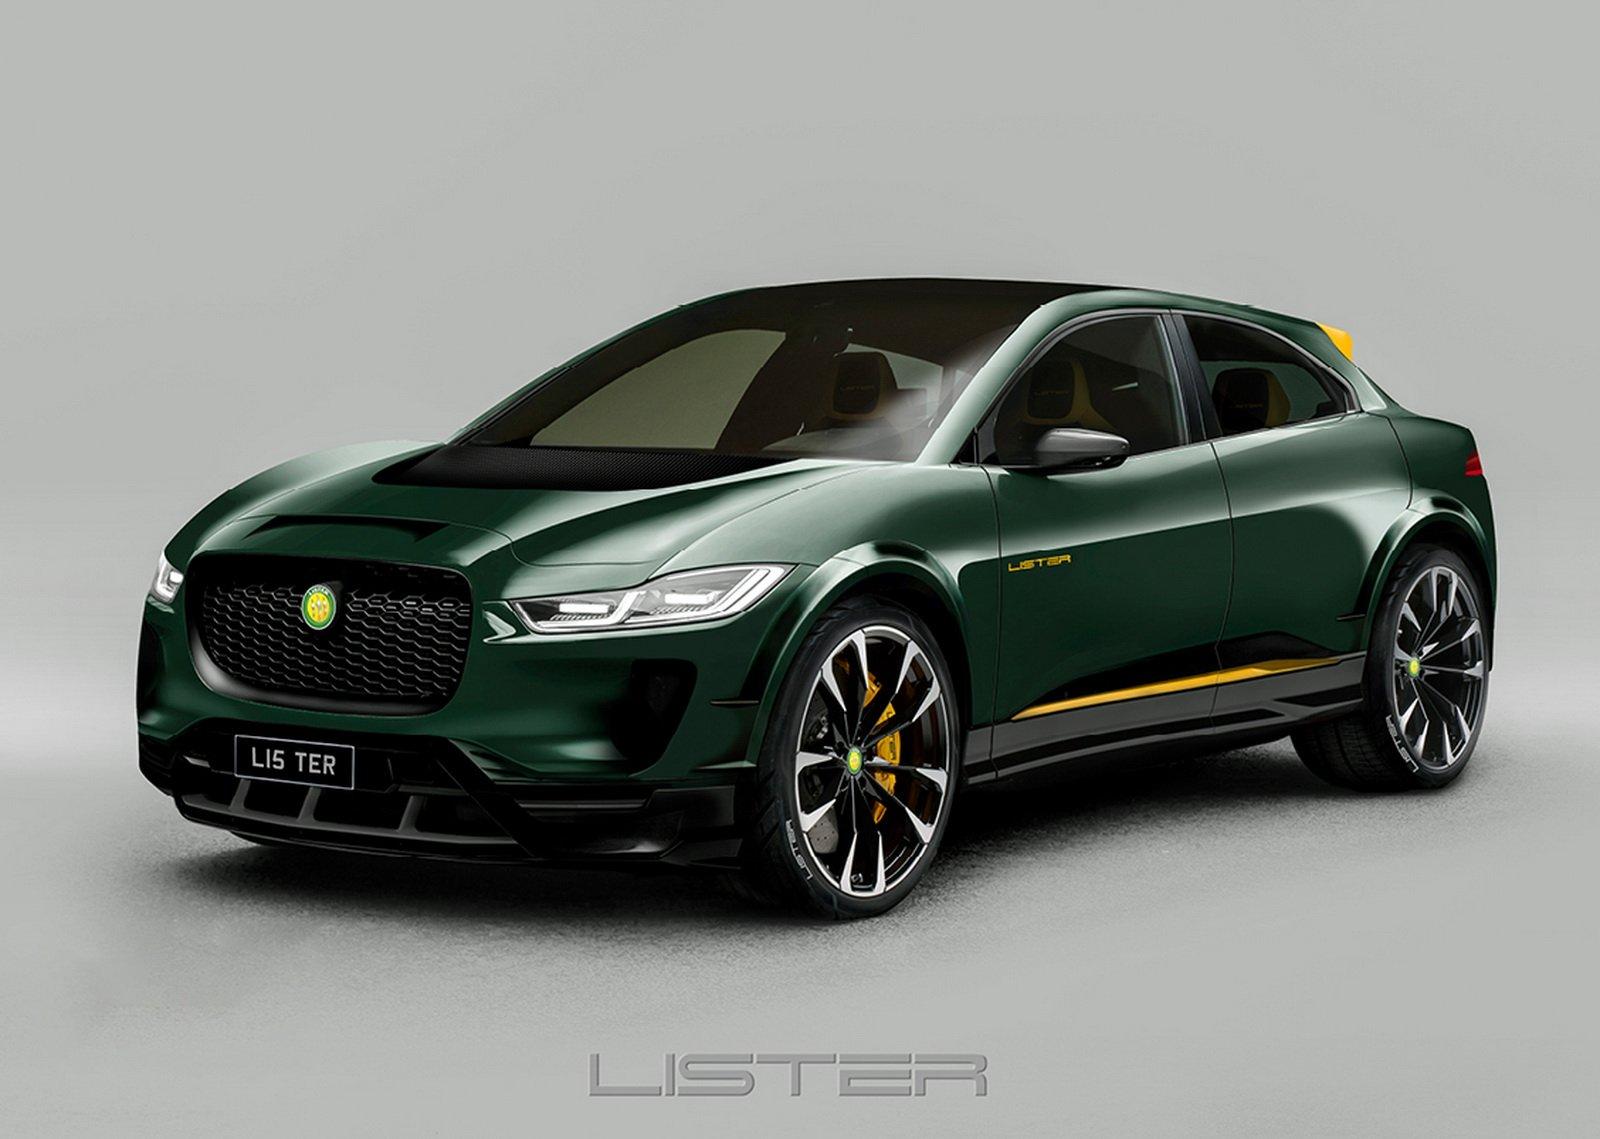 Lister Suv E Jaguar Ipace (1)